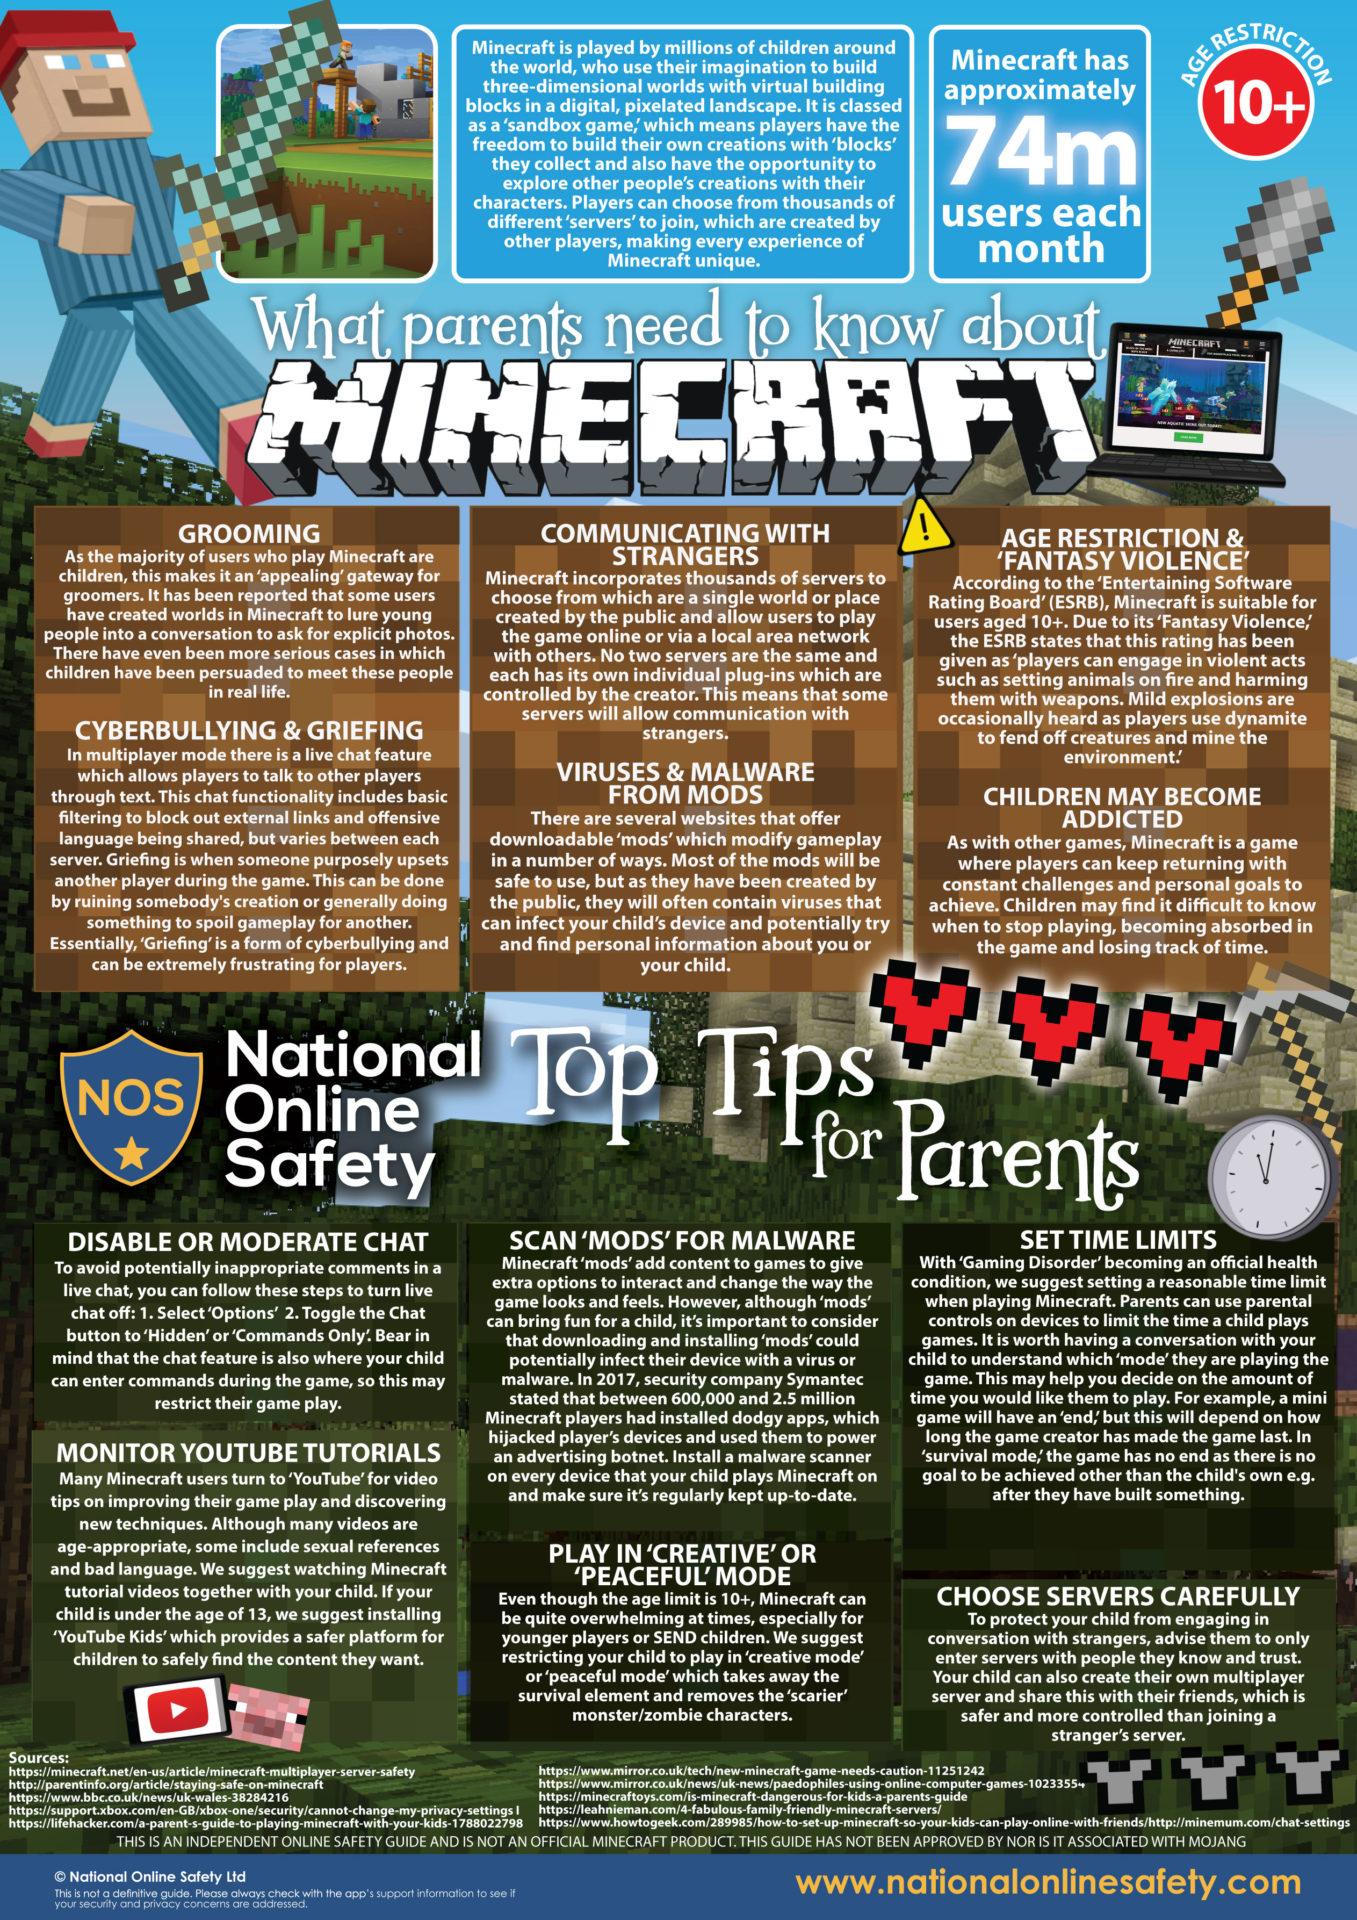 Minecraft - Ballycarrickmaddy Primary School